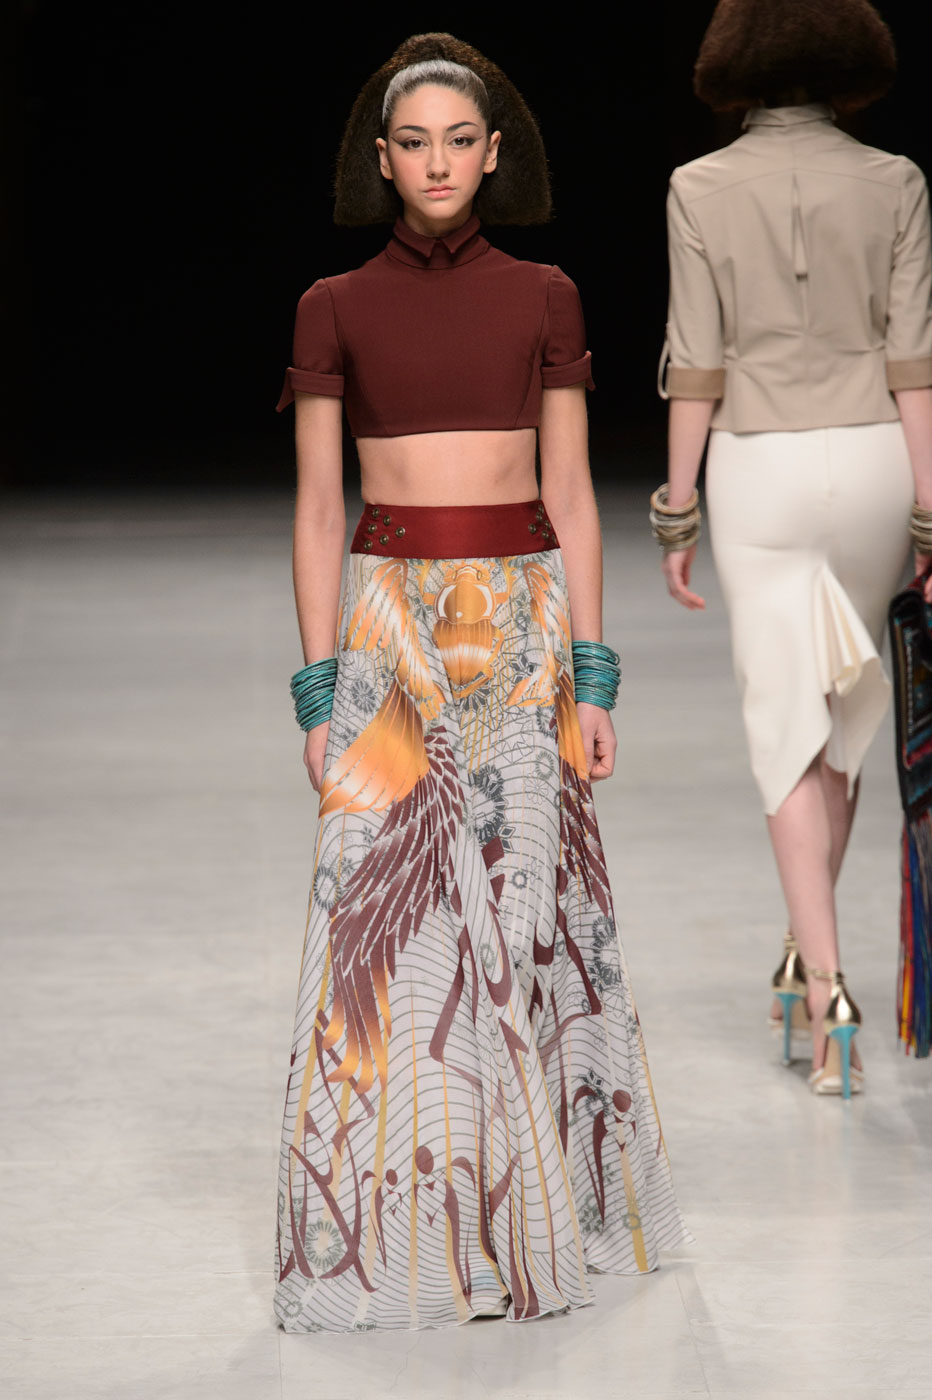 Julien-Fournie-Prive-fashion-runway-show-haute-couture-paris-spring-2015-the-impression-16